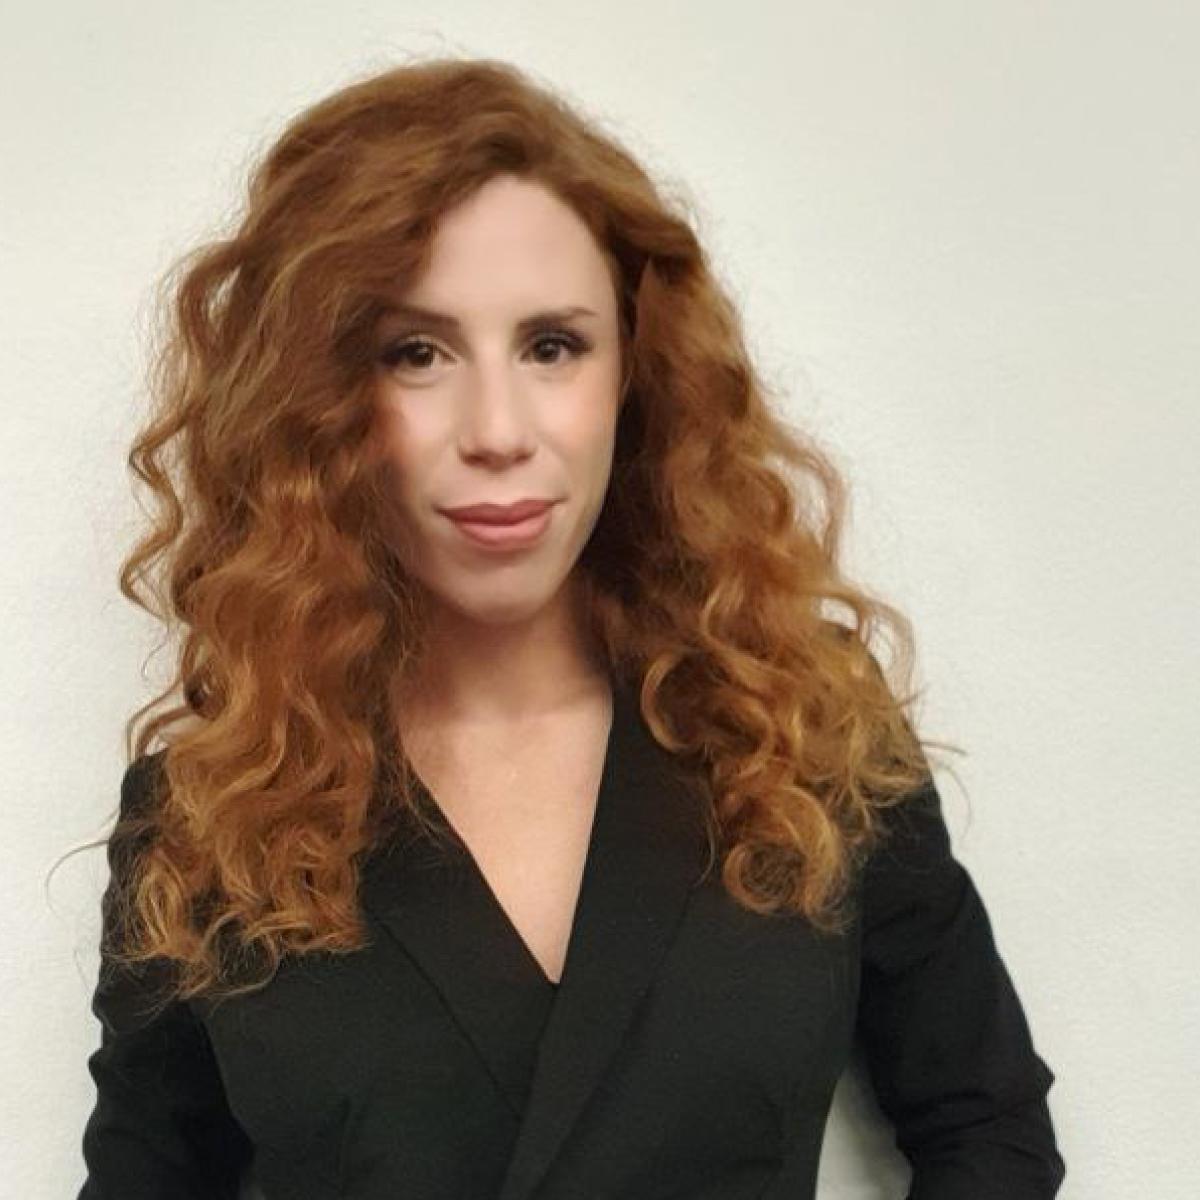 Giorgia Perisano